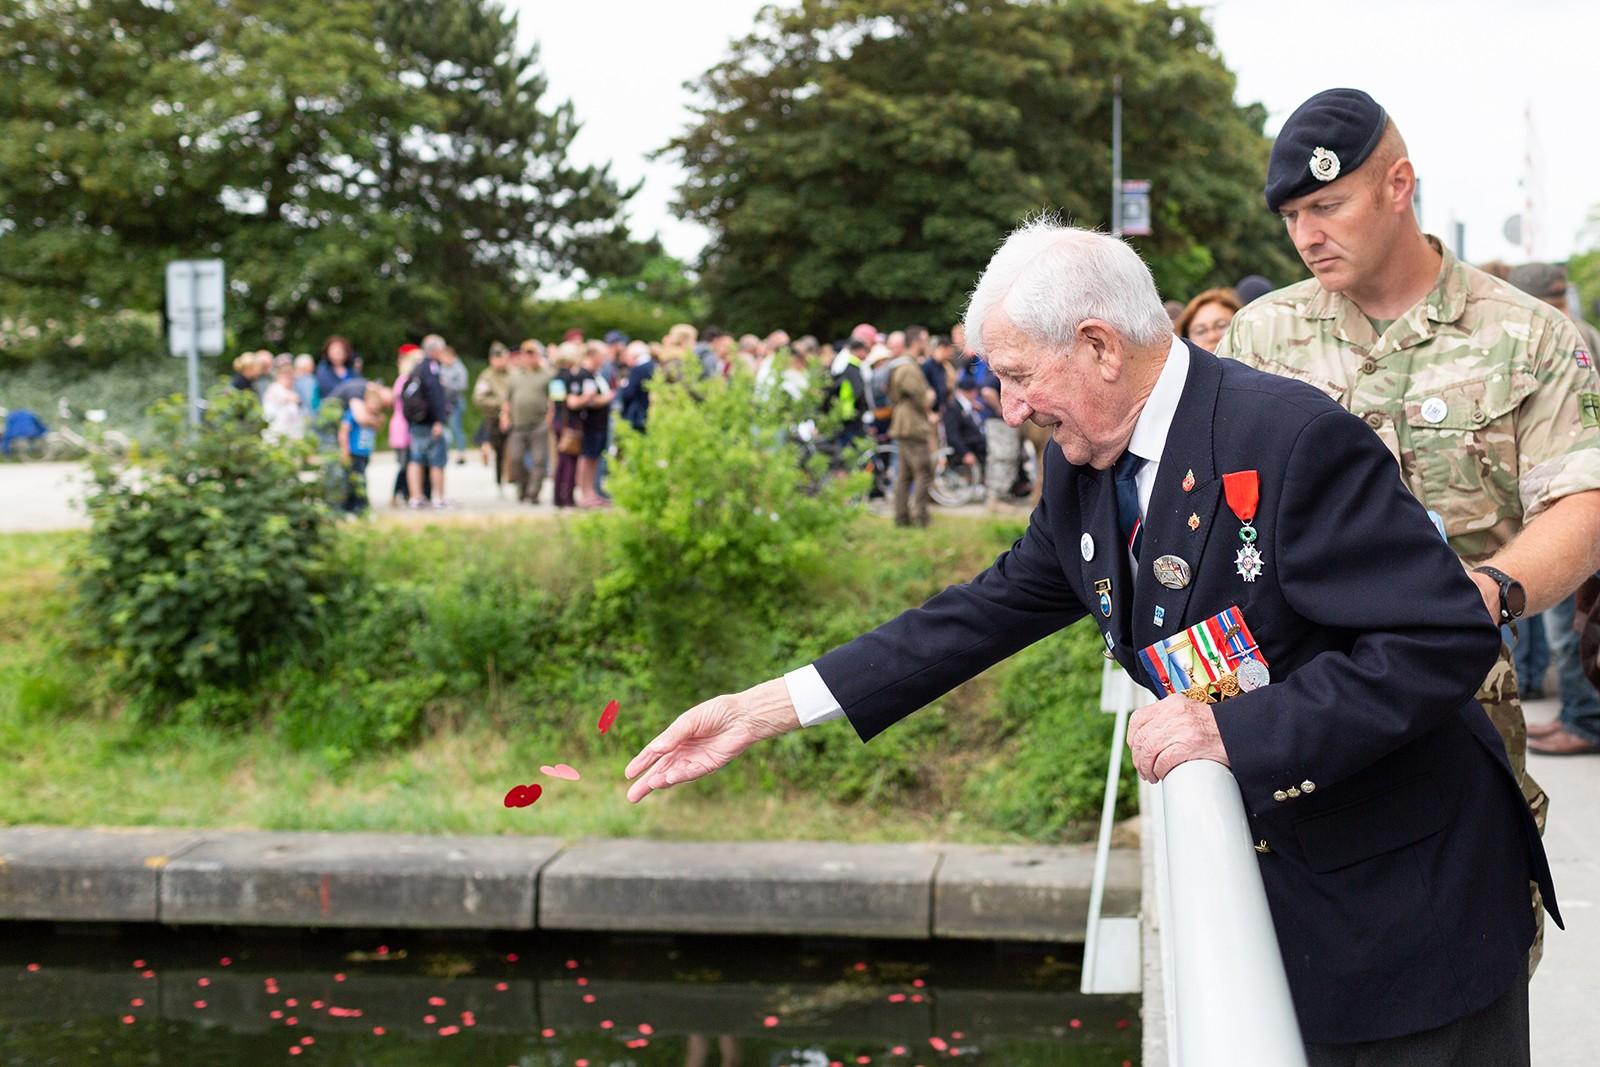 D-Day veteran remembers fallen comrades